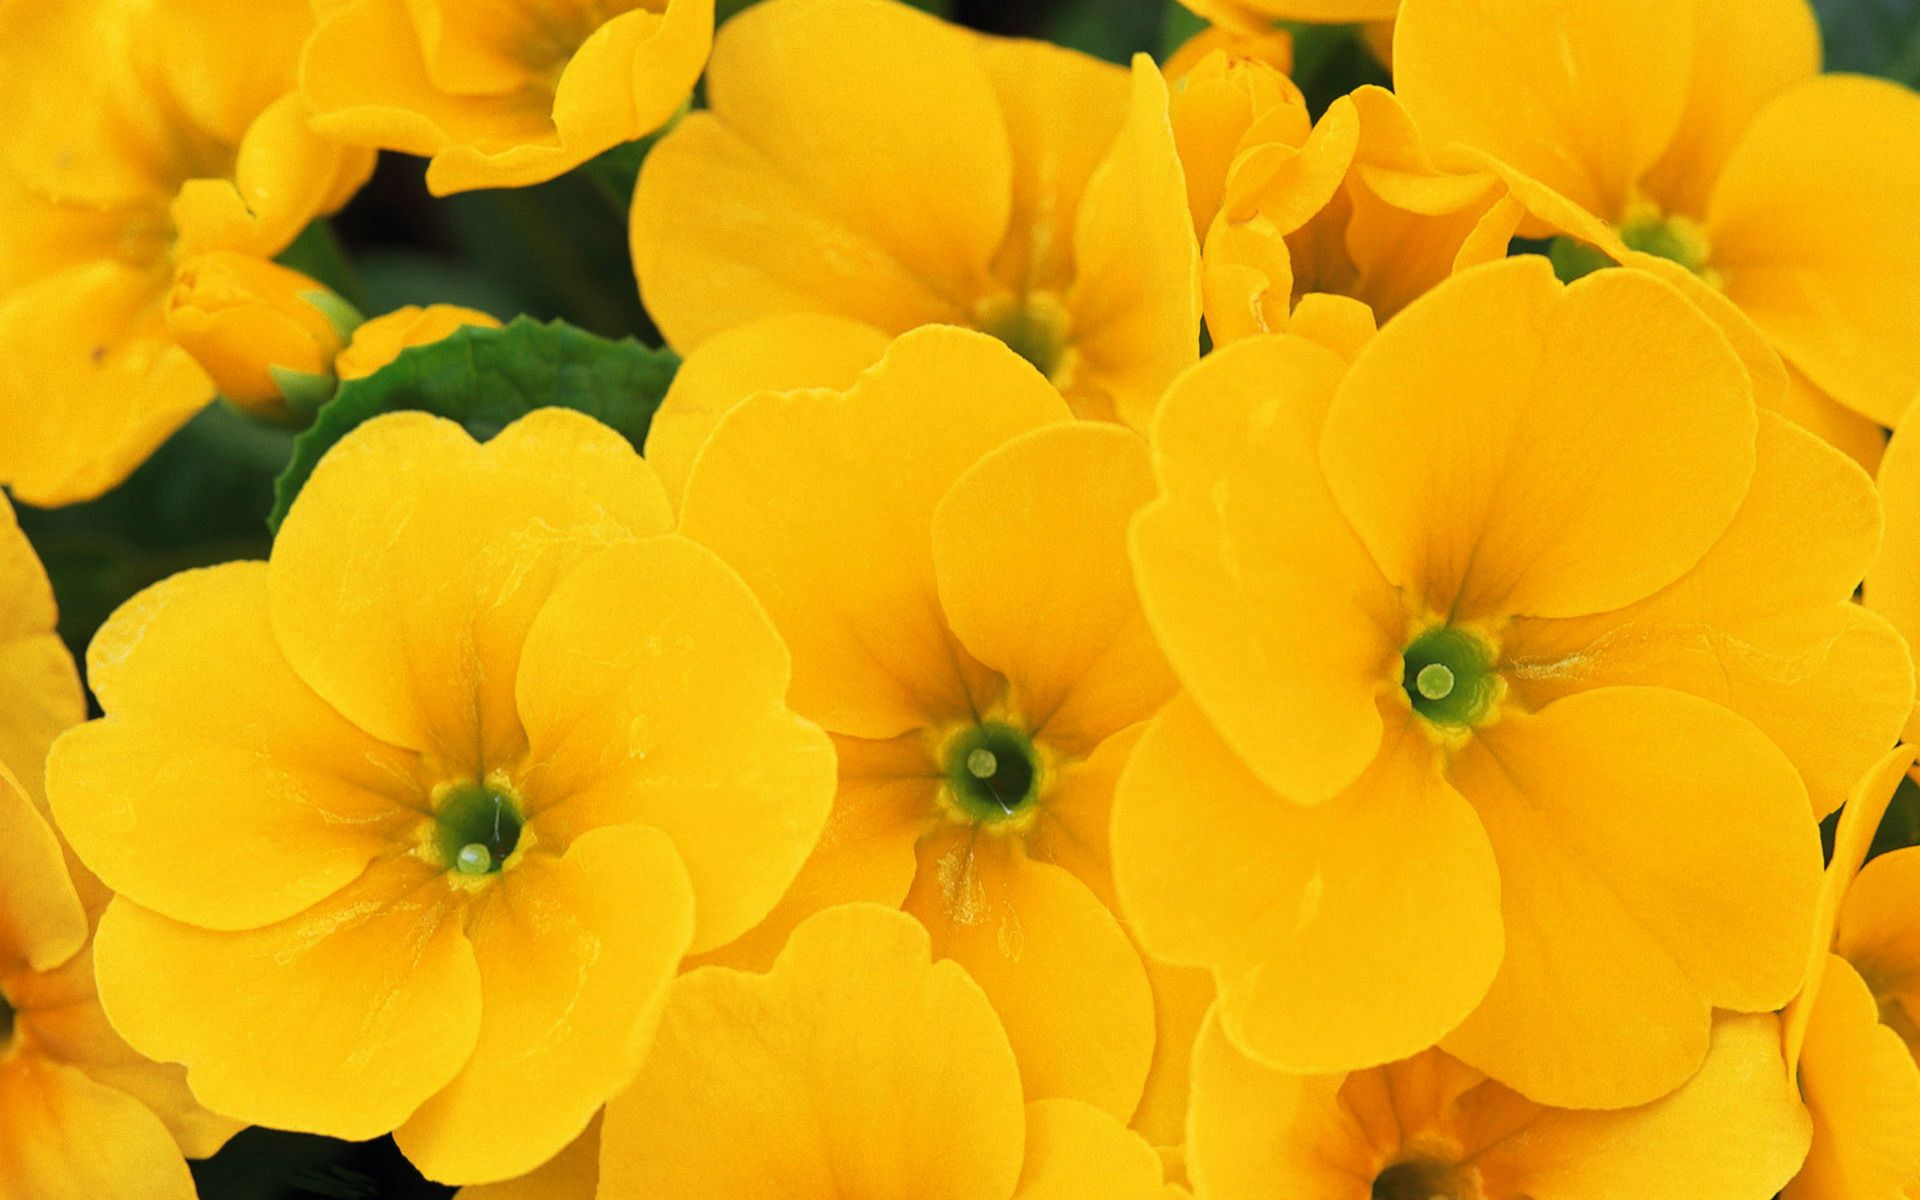 HD Yellow Flowers Wallpaper Download Free 97211